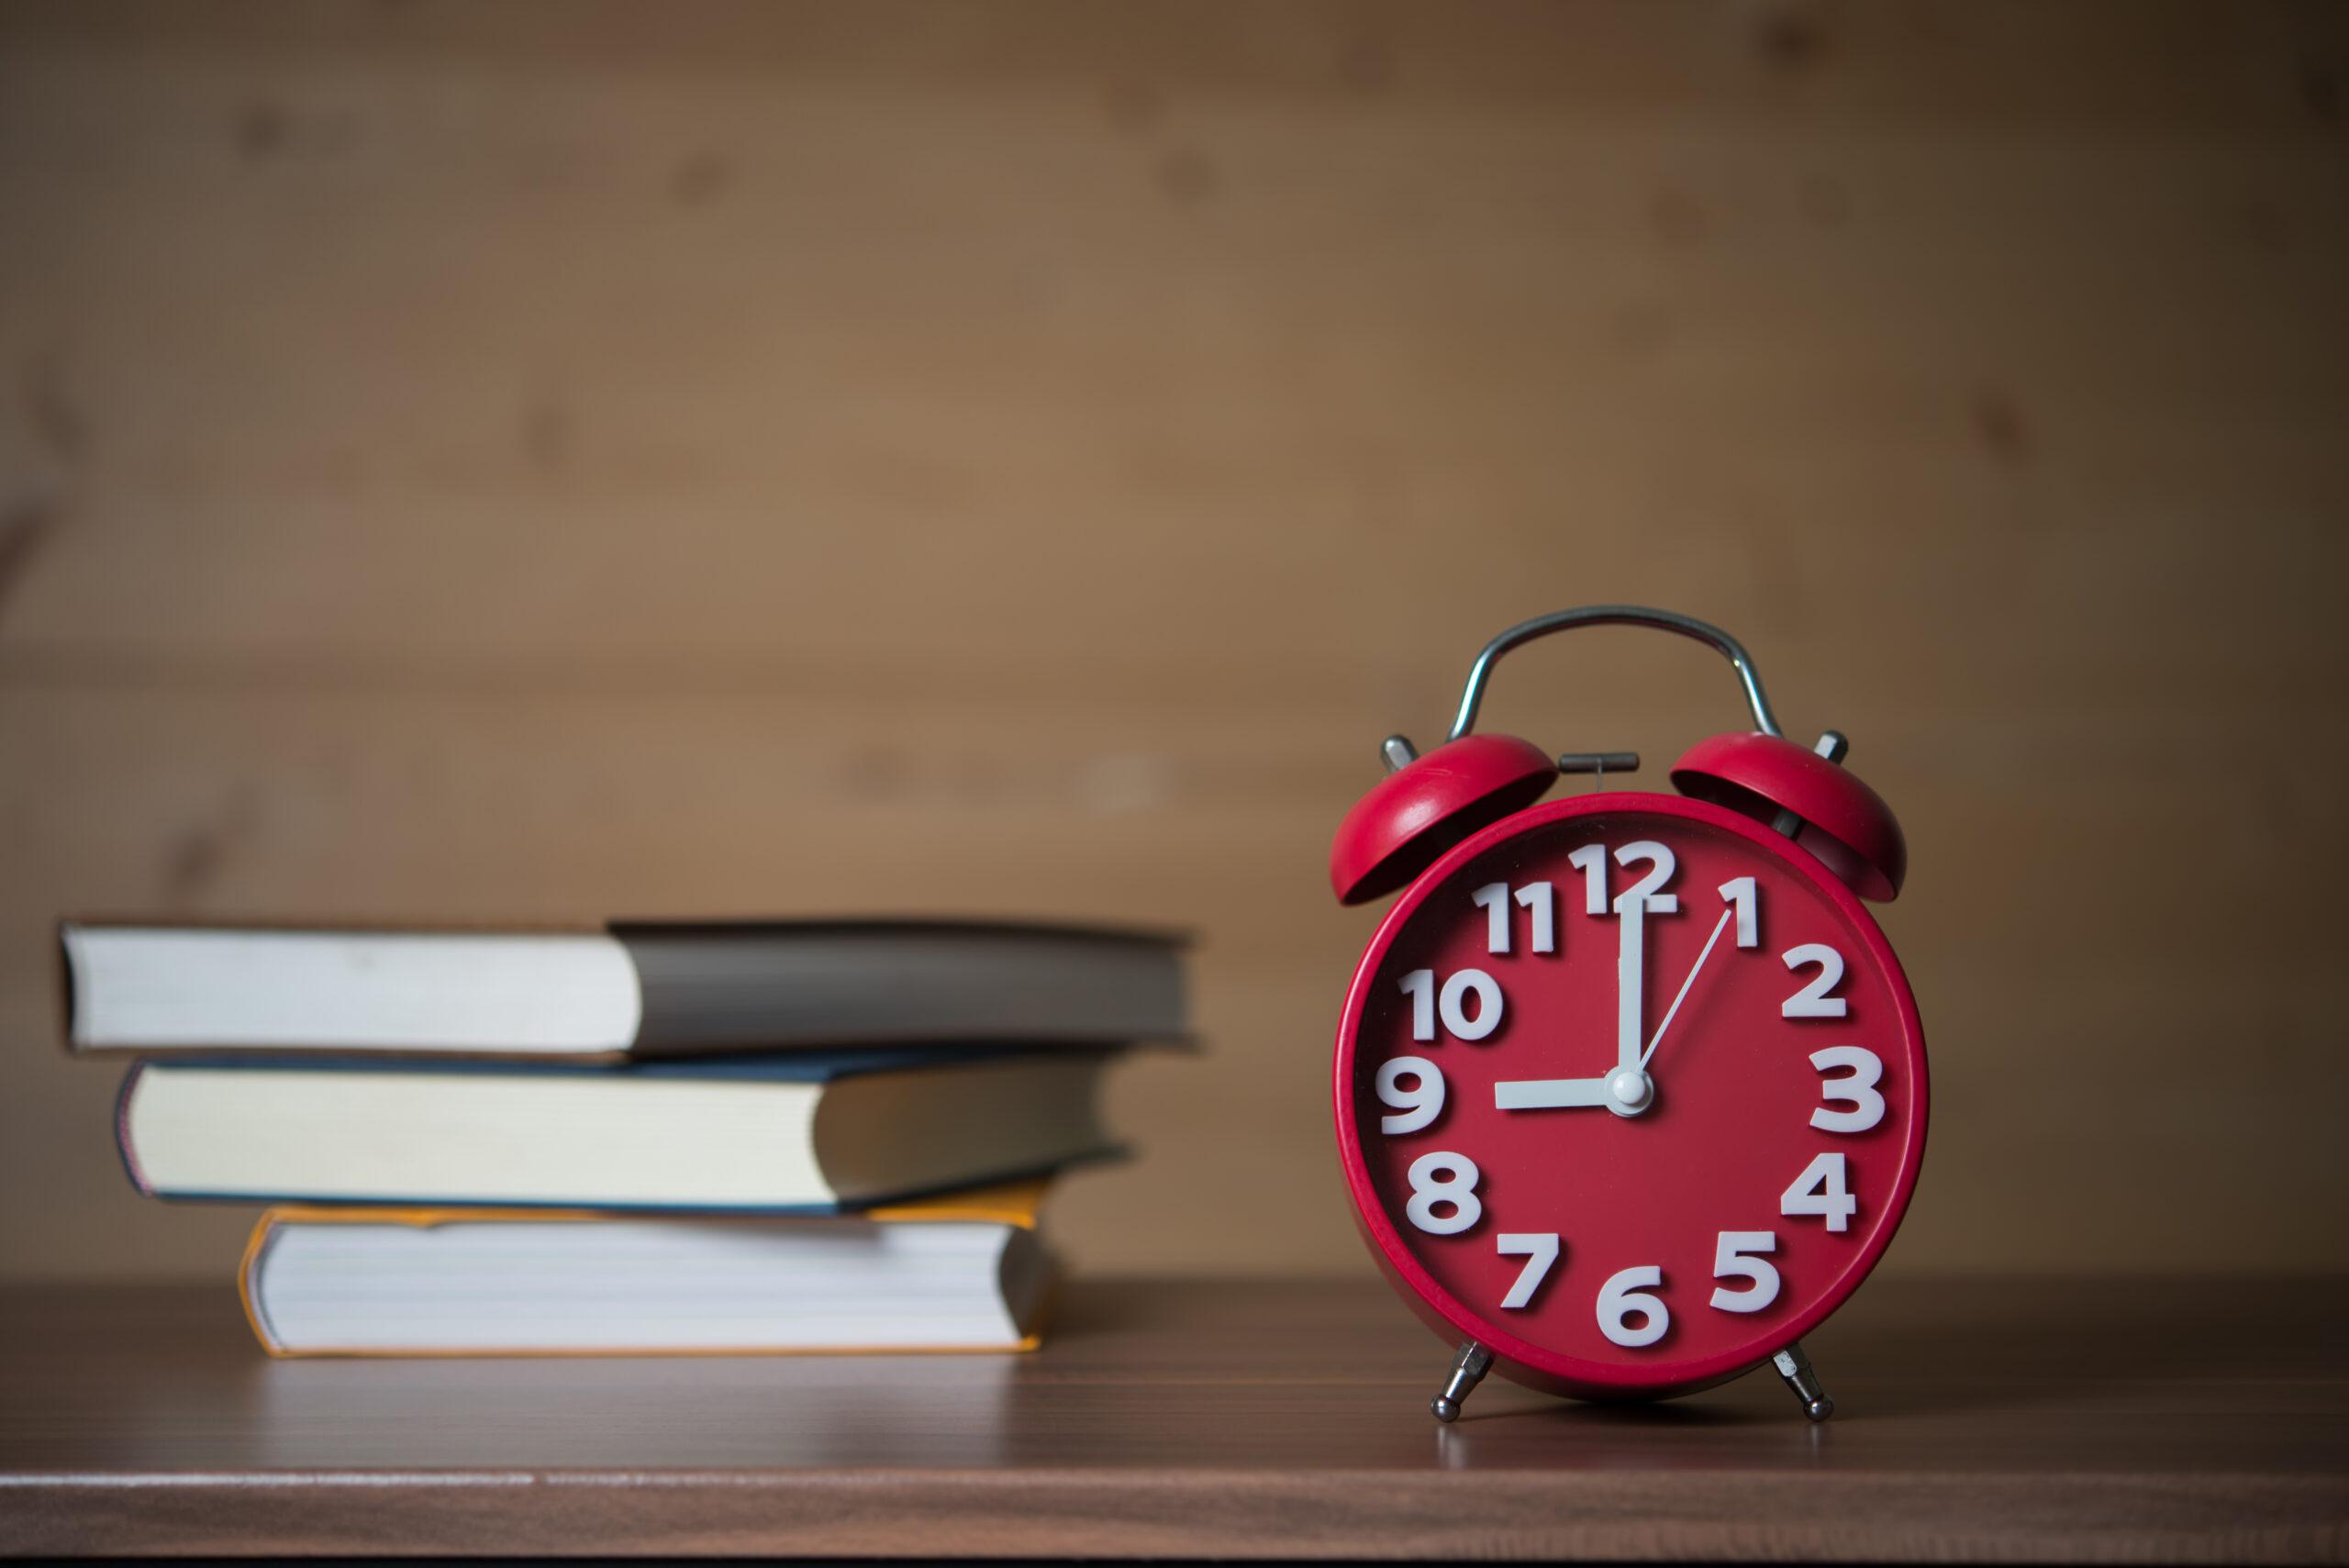 Будилник и книги на бюро